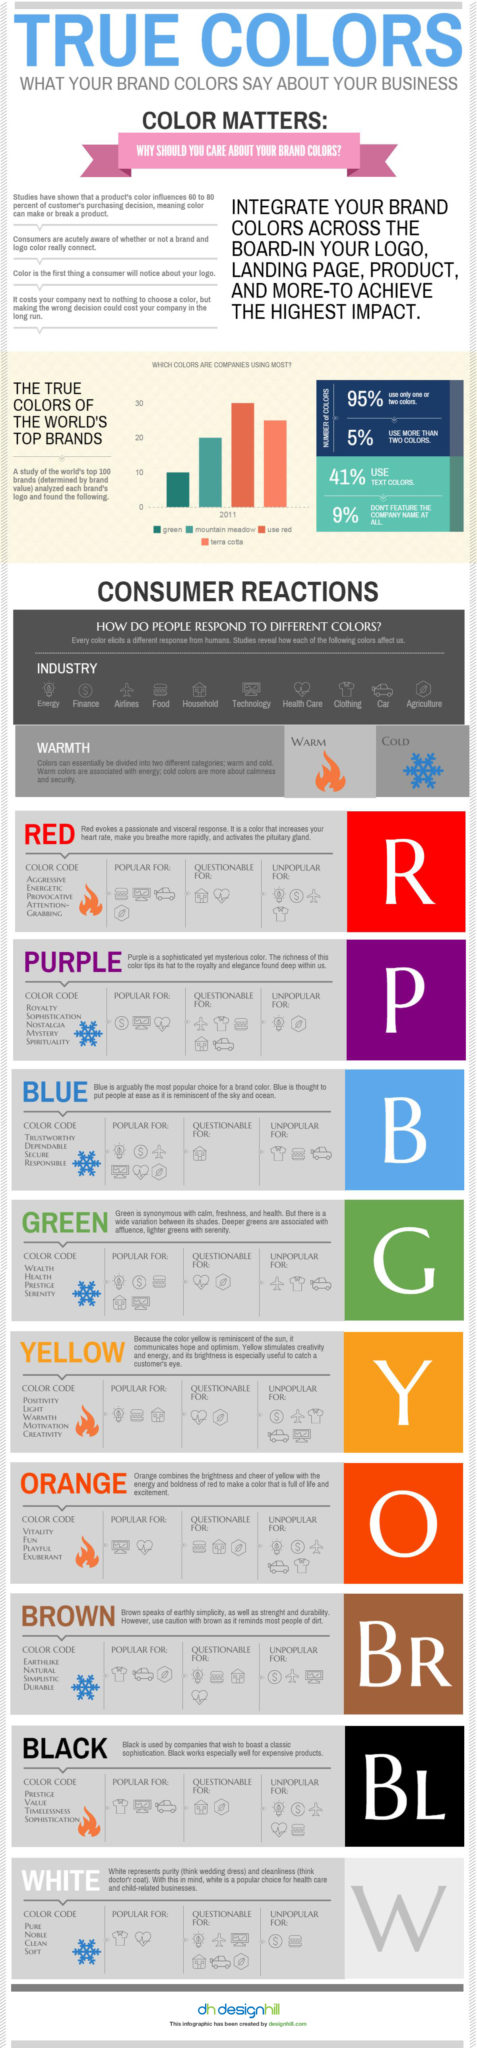 true-colors-Infographic